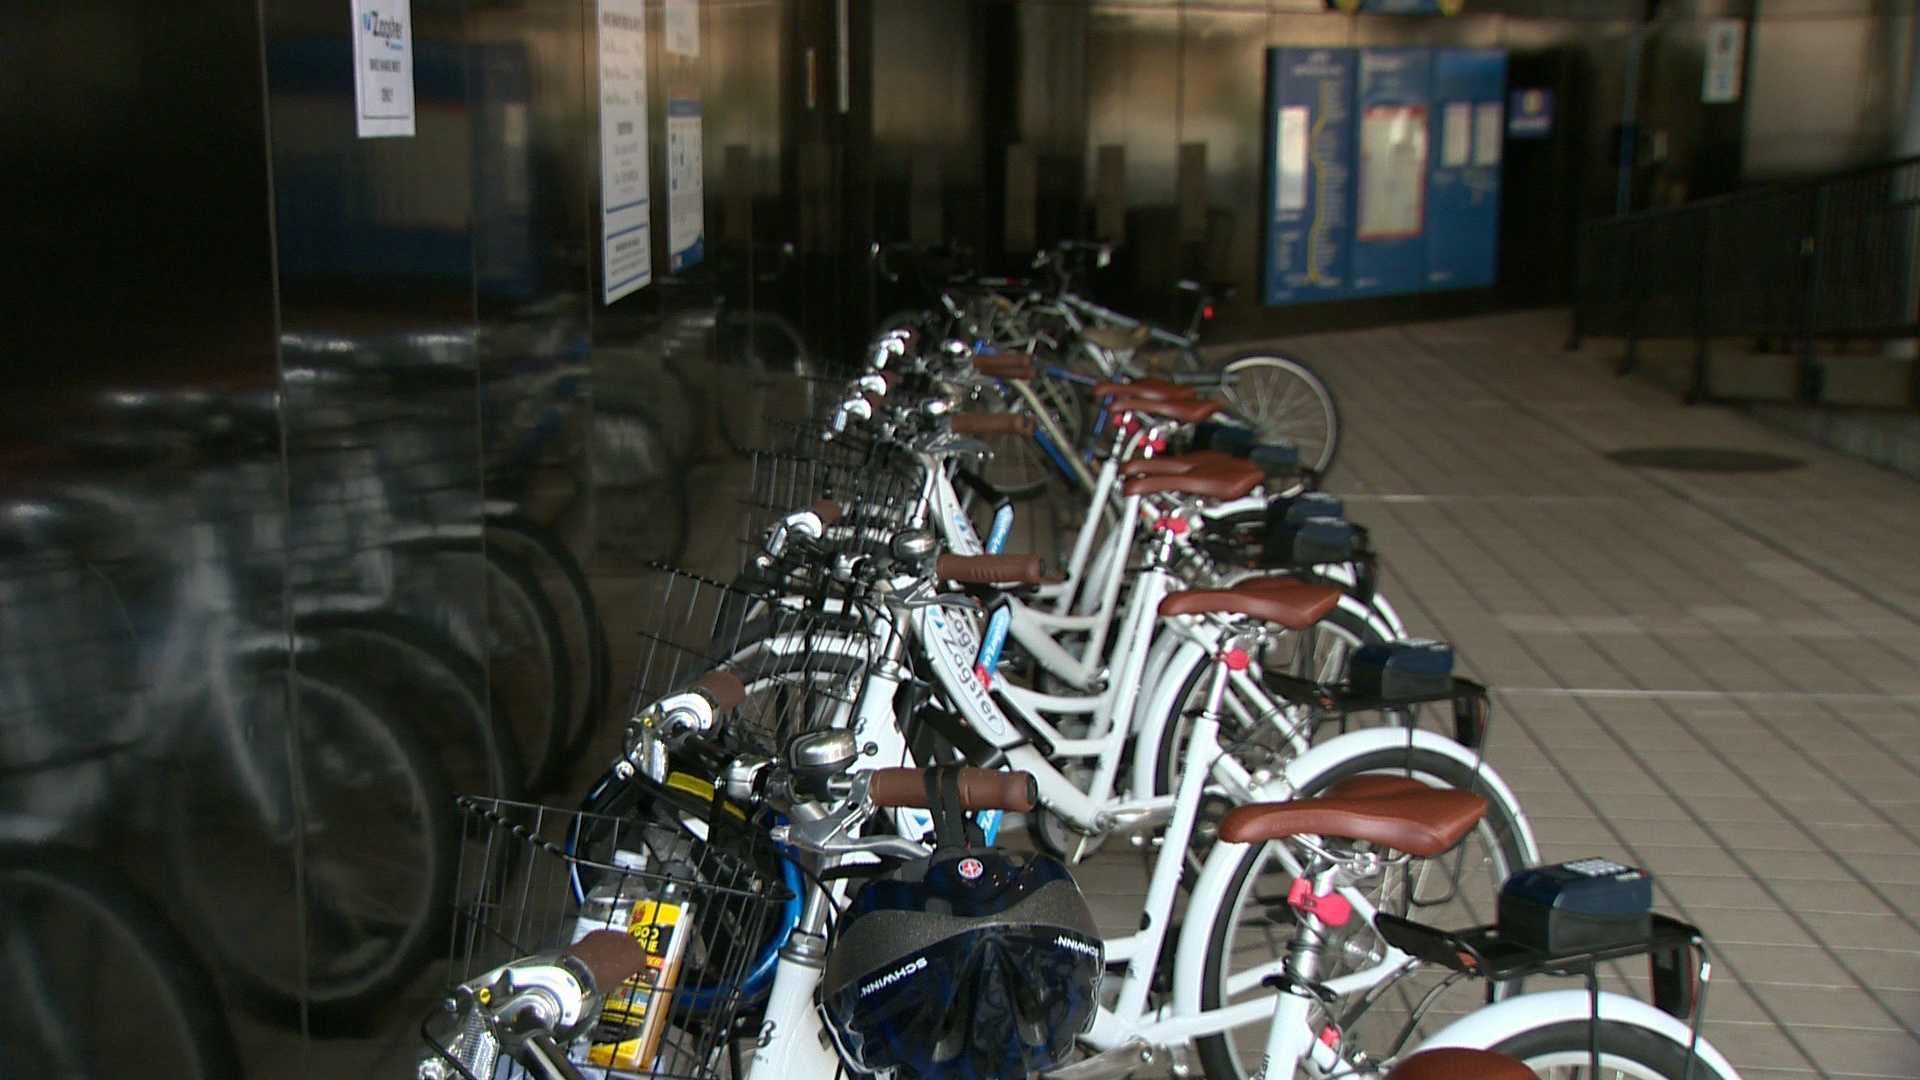 BWI bike share